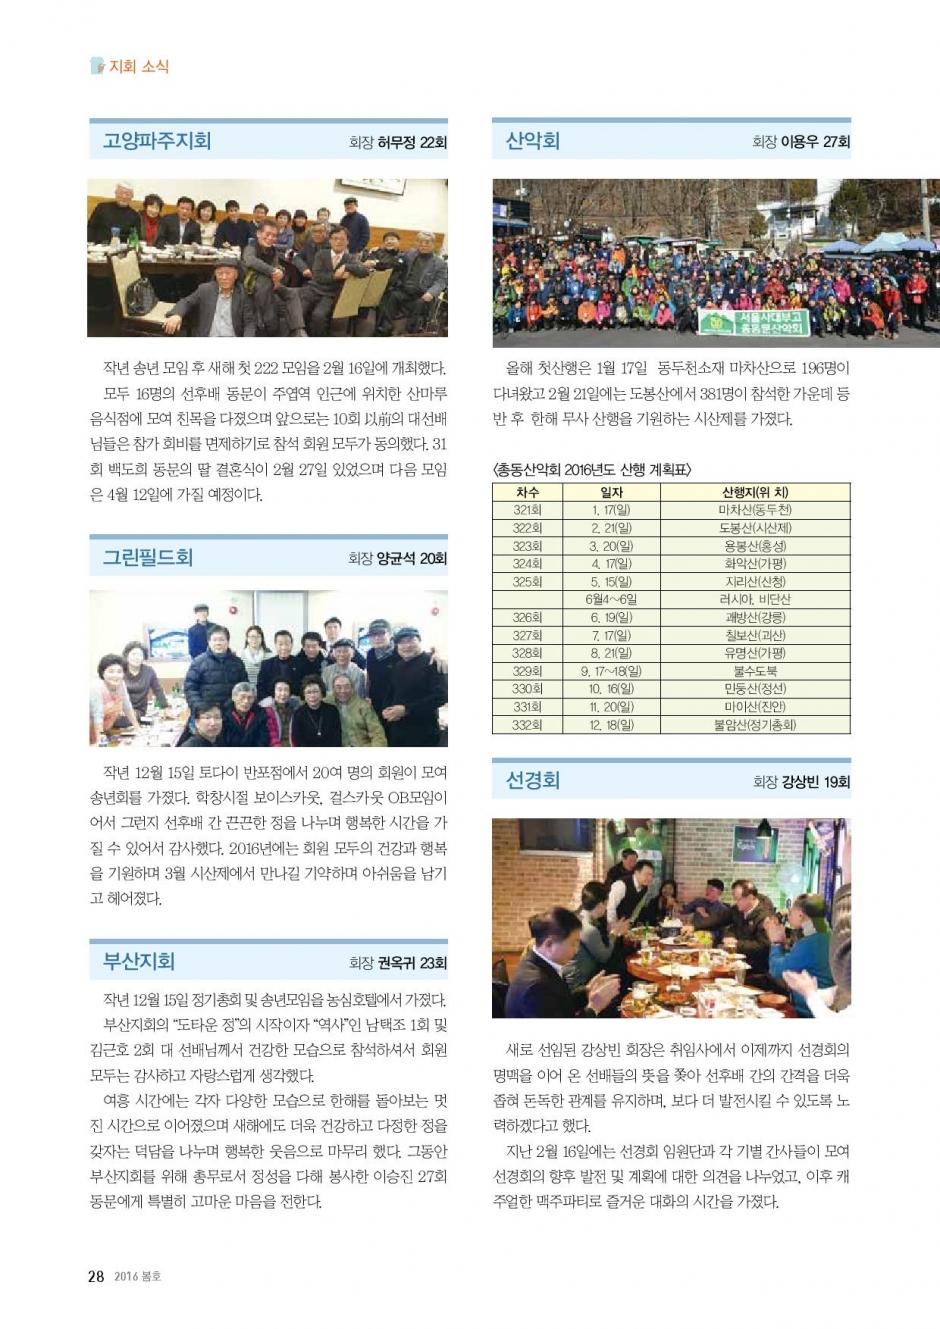 snubugo_98-page-028.jpg